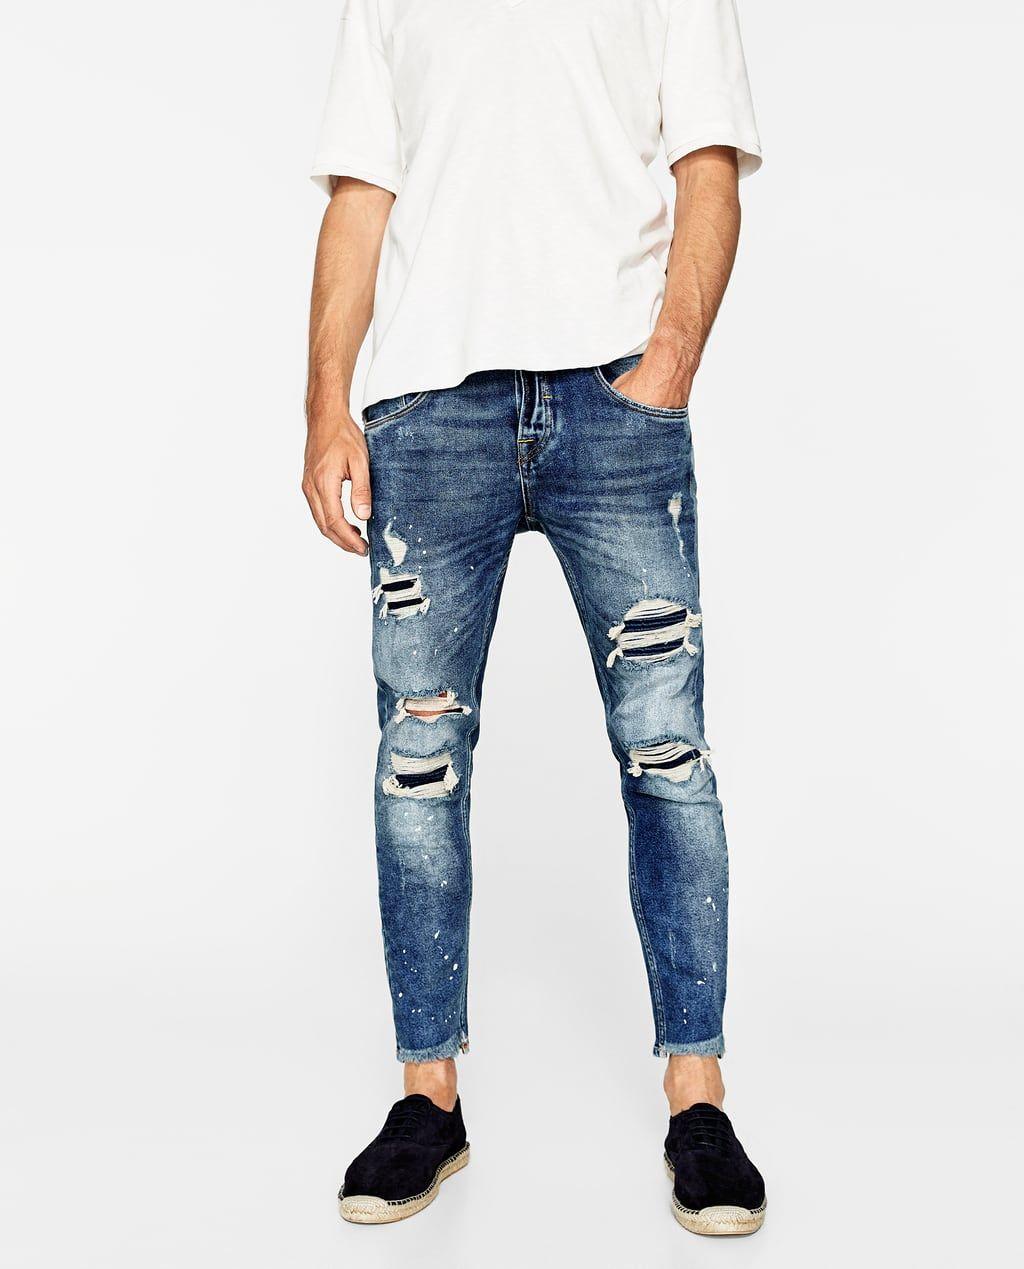 Pantalon Con Rotos Y Pliegues Zara Man Jeans Stylish Mens Outfits Mens Fashion Rugged